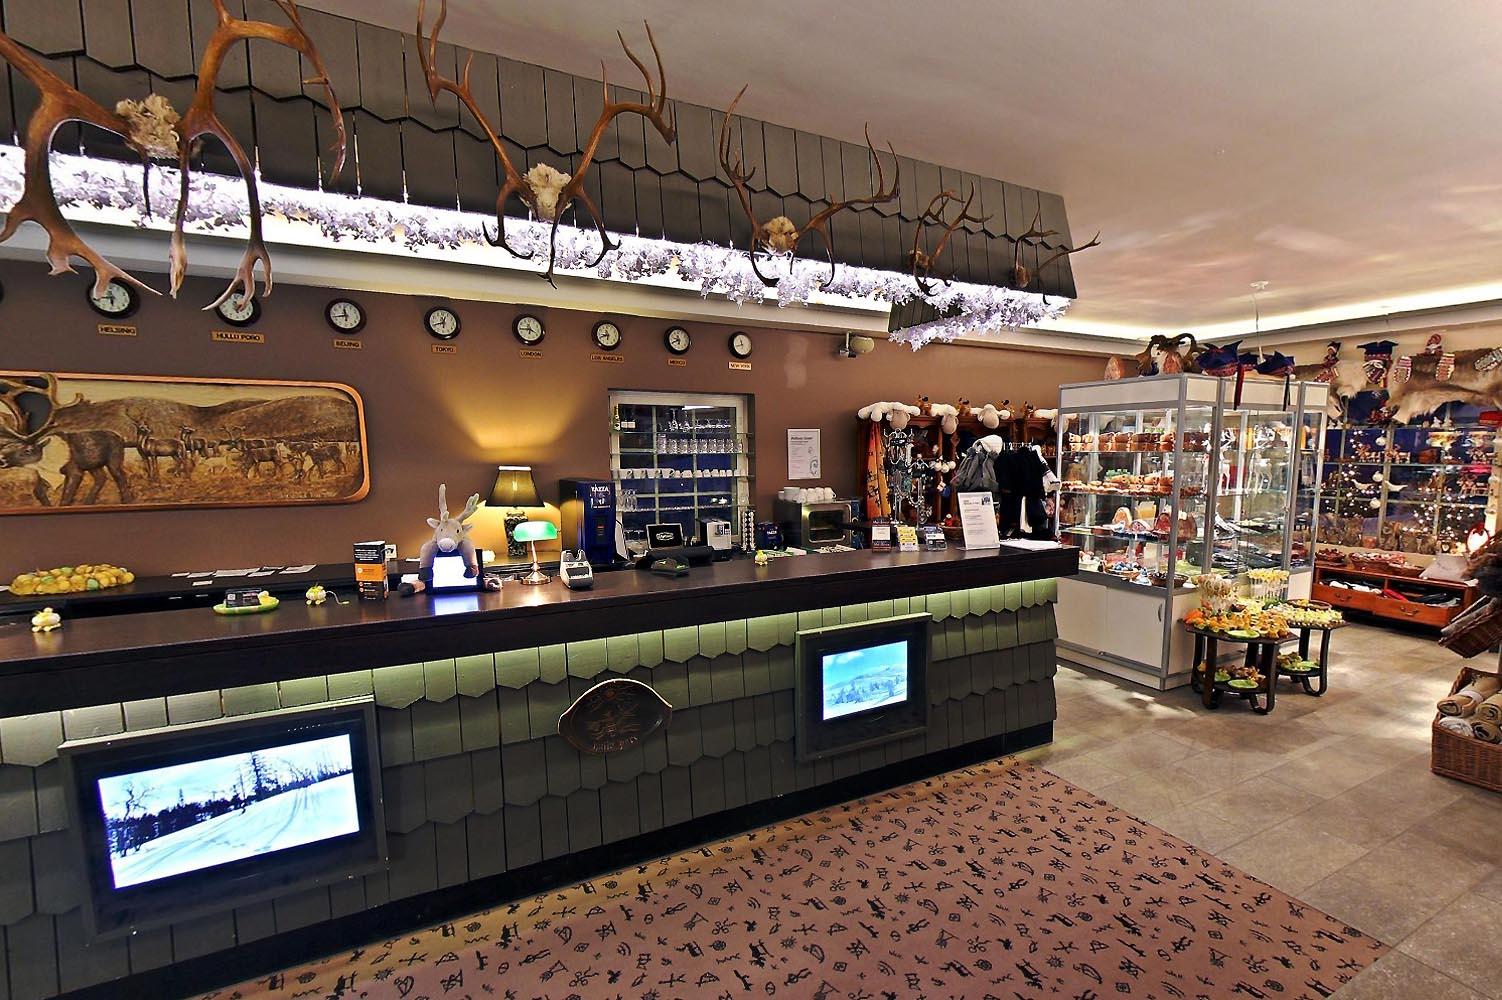 http://www.hulluporo.fi/wp-content/uploads/2014/12/Hotel-HulluPoro-reception-shop.jpg